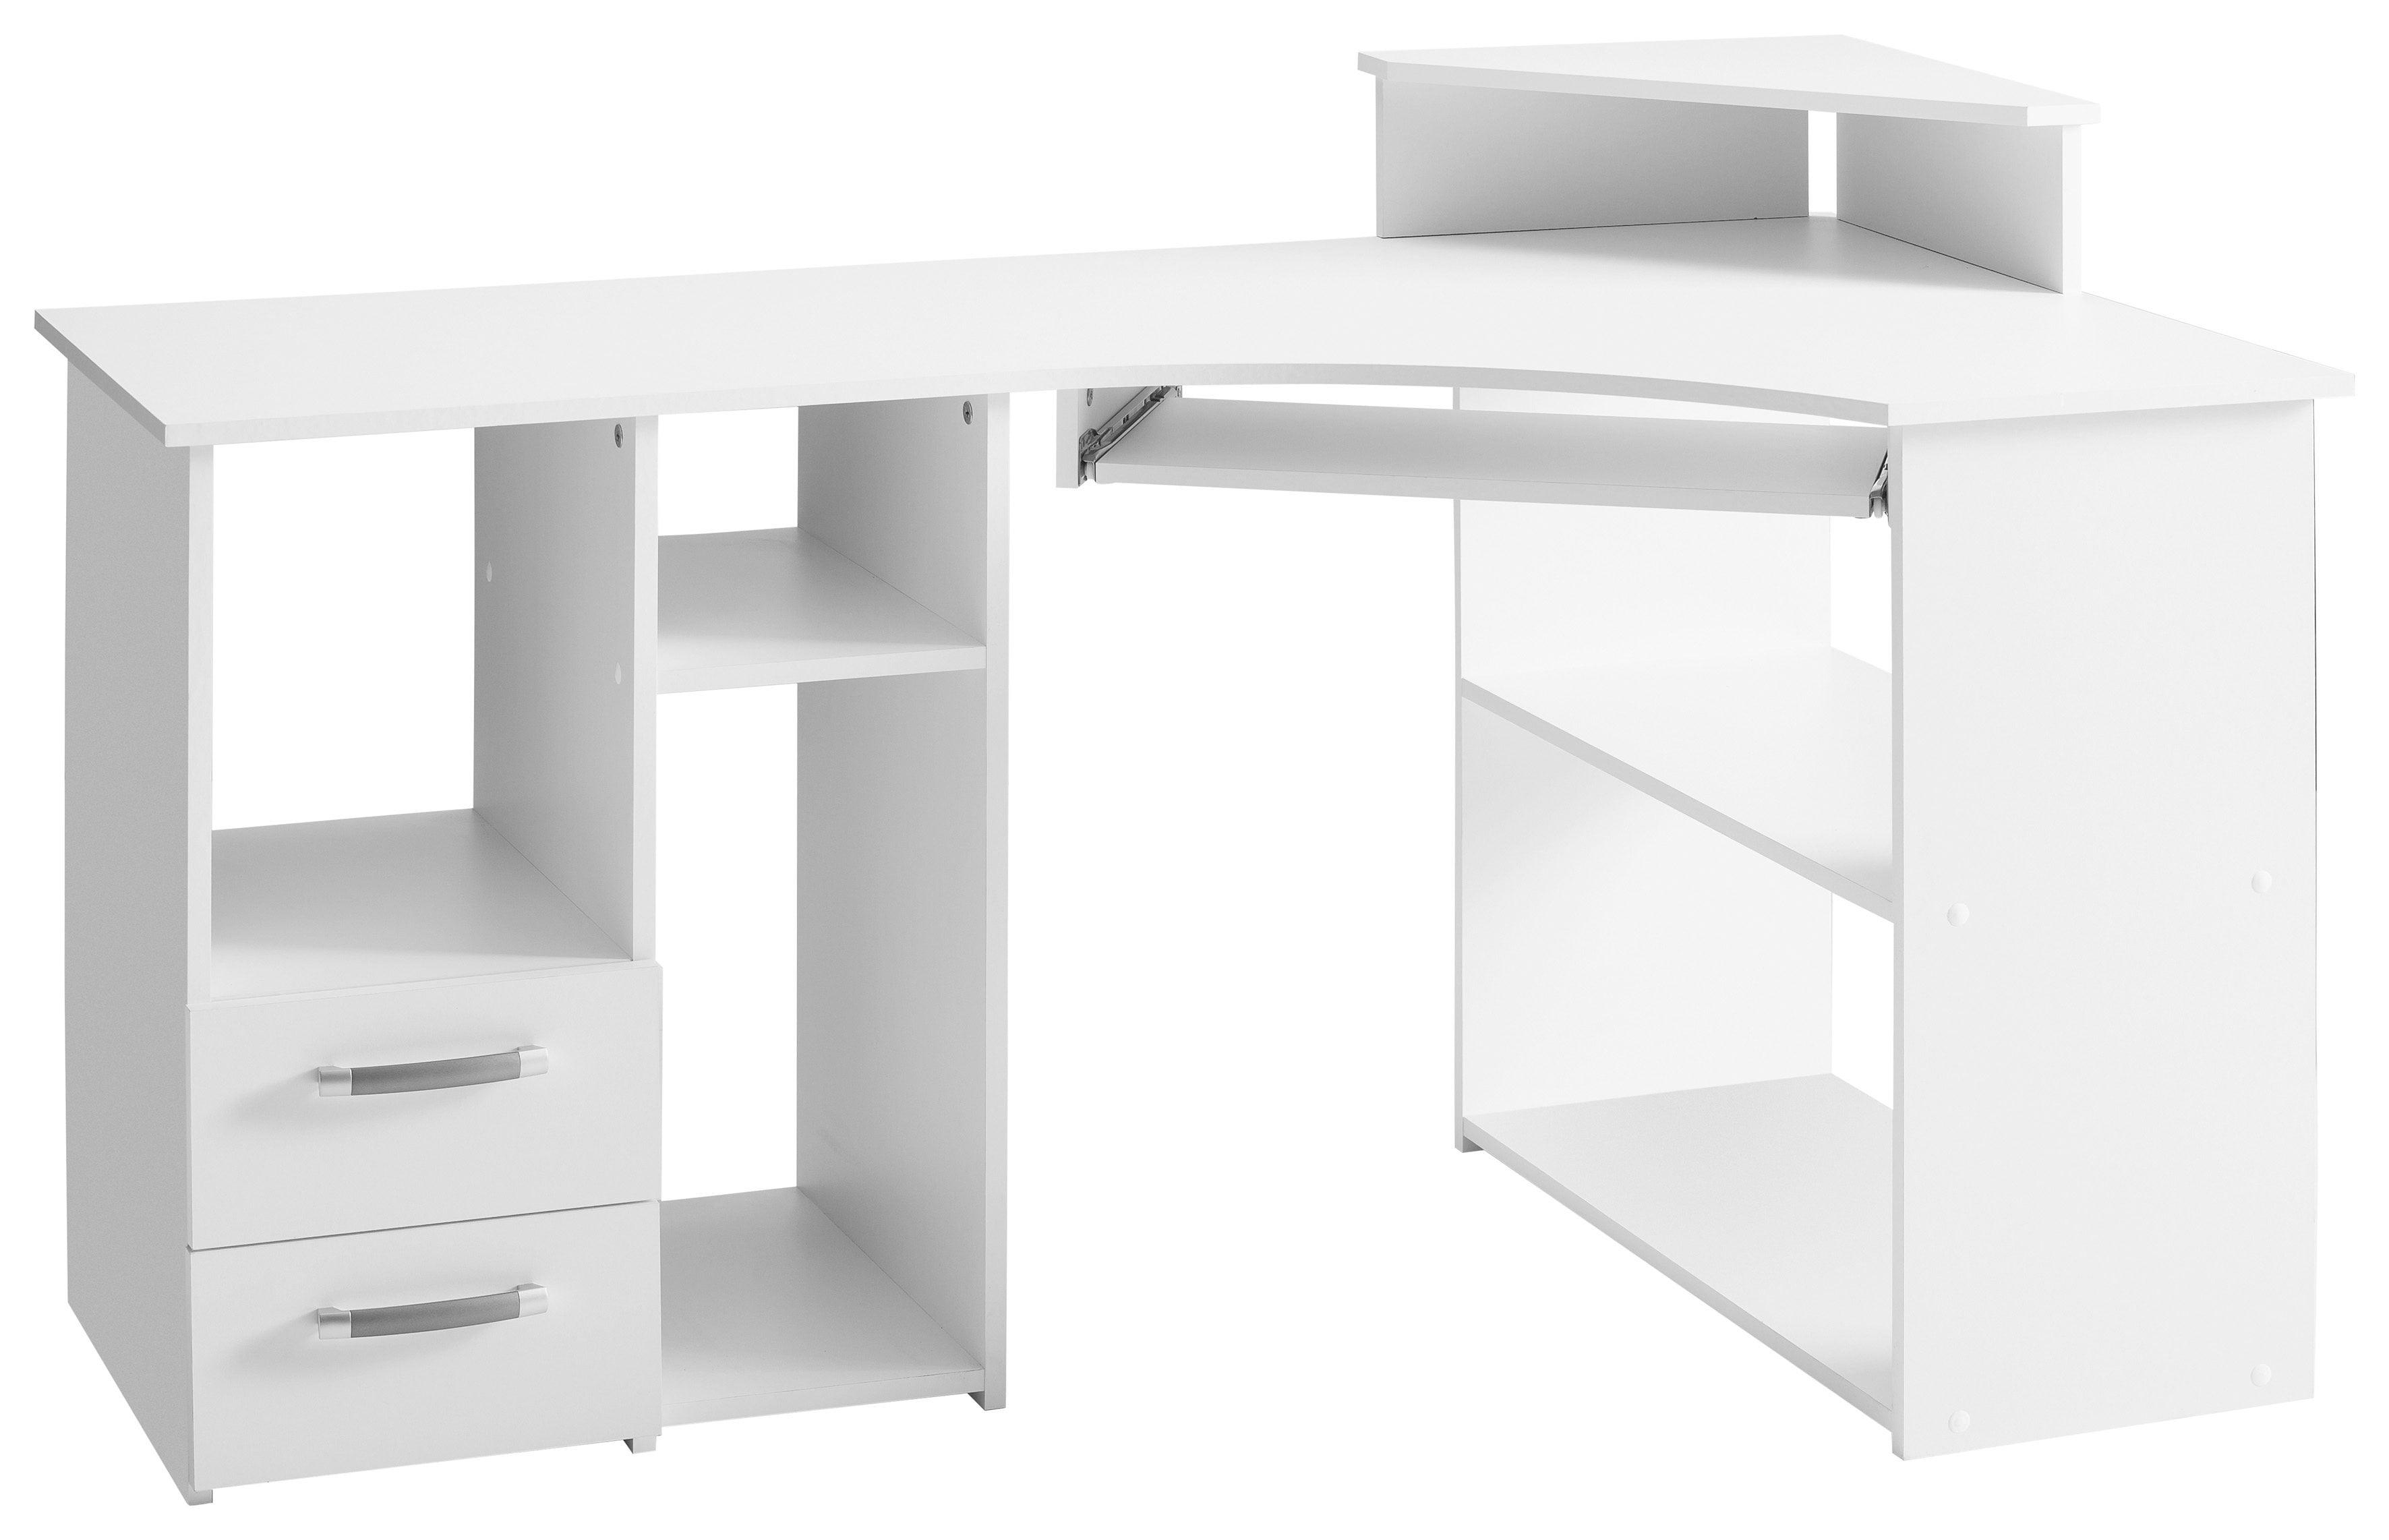 tastaturauszug preisvergleich die besten angebote online. Black Bedroom Furniture Sets. Home Design Ideas